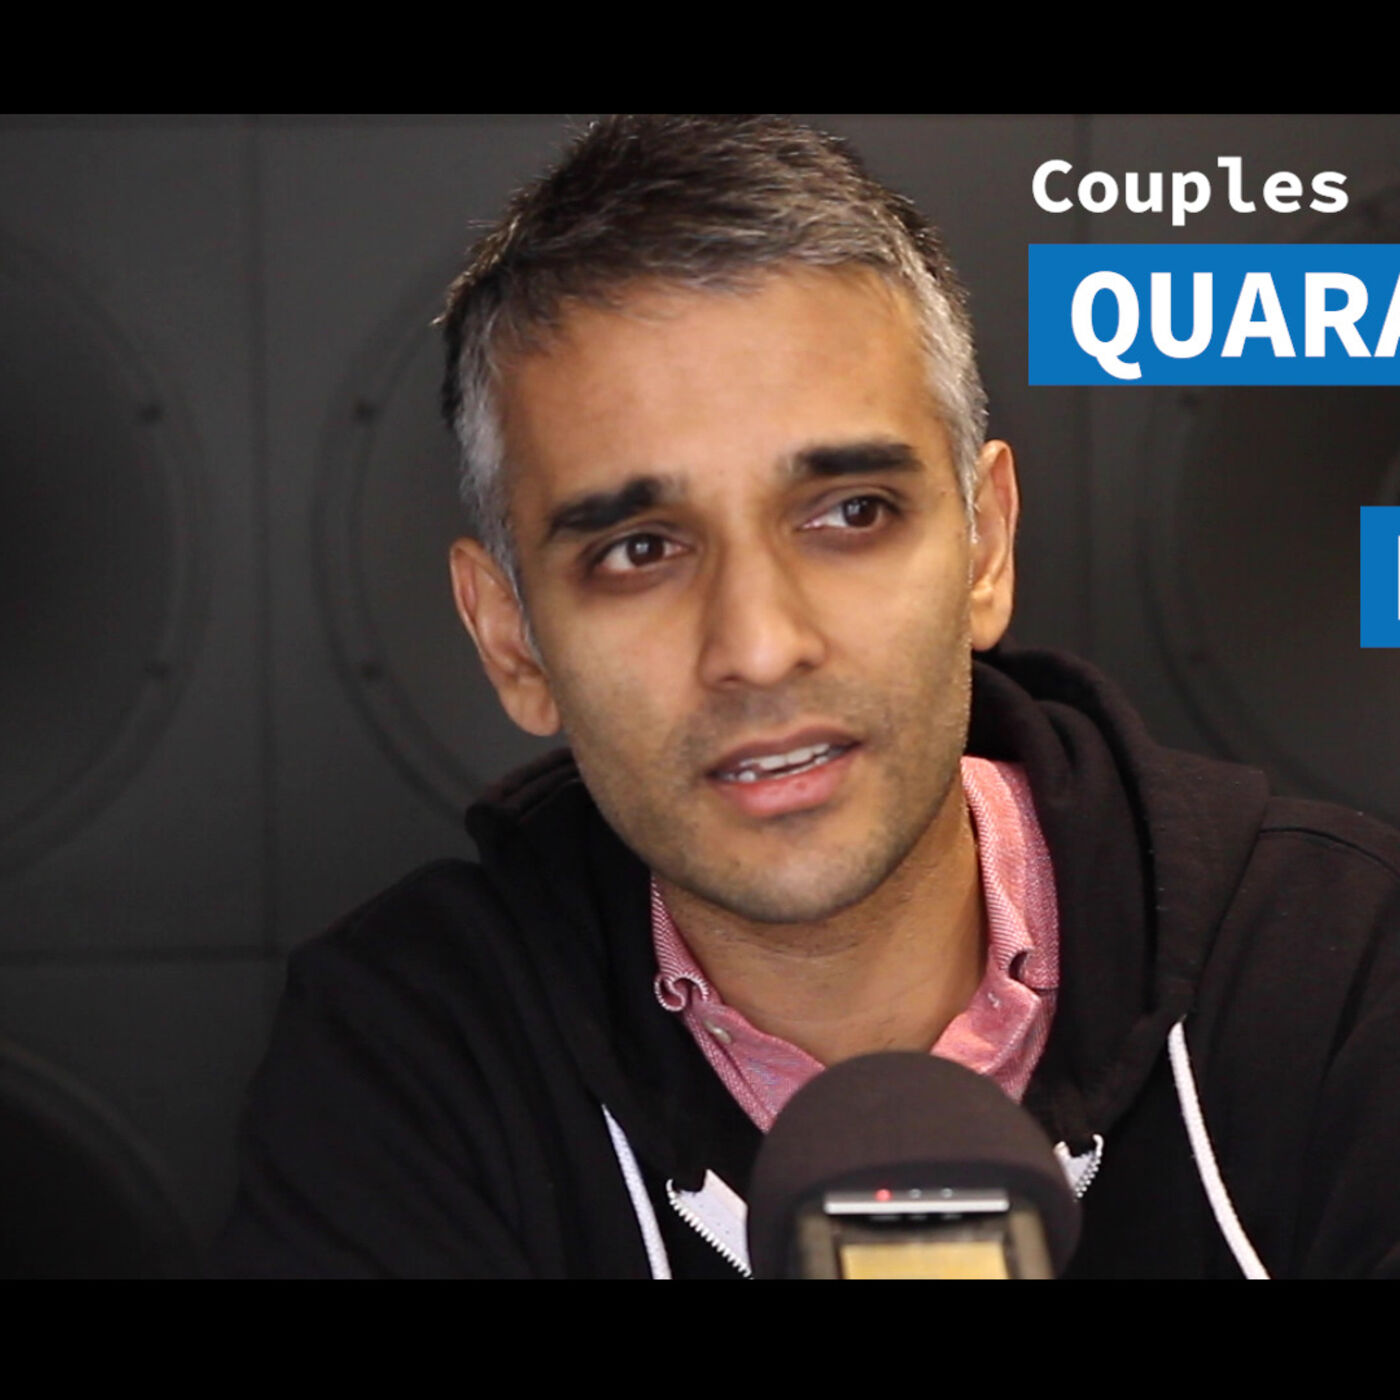 Couples, Quarantine & Digital Marketing